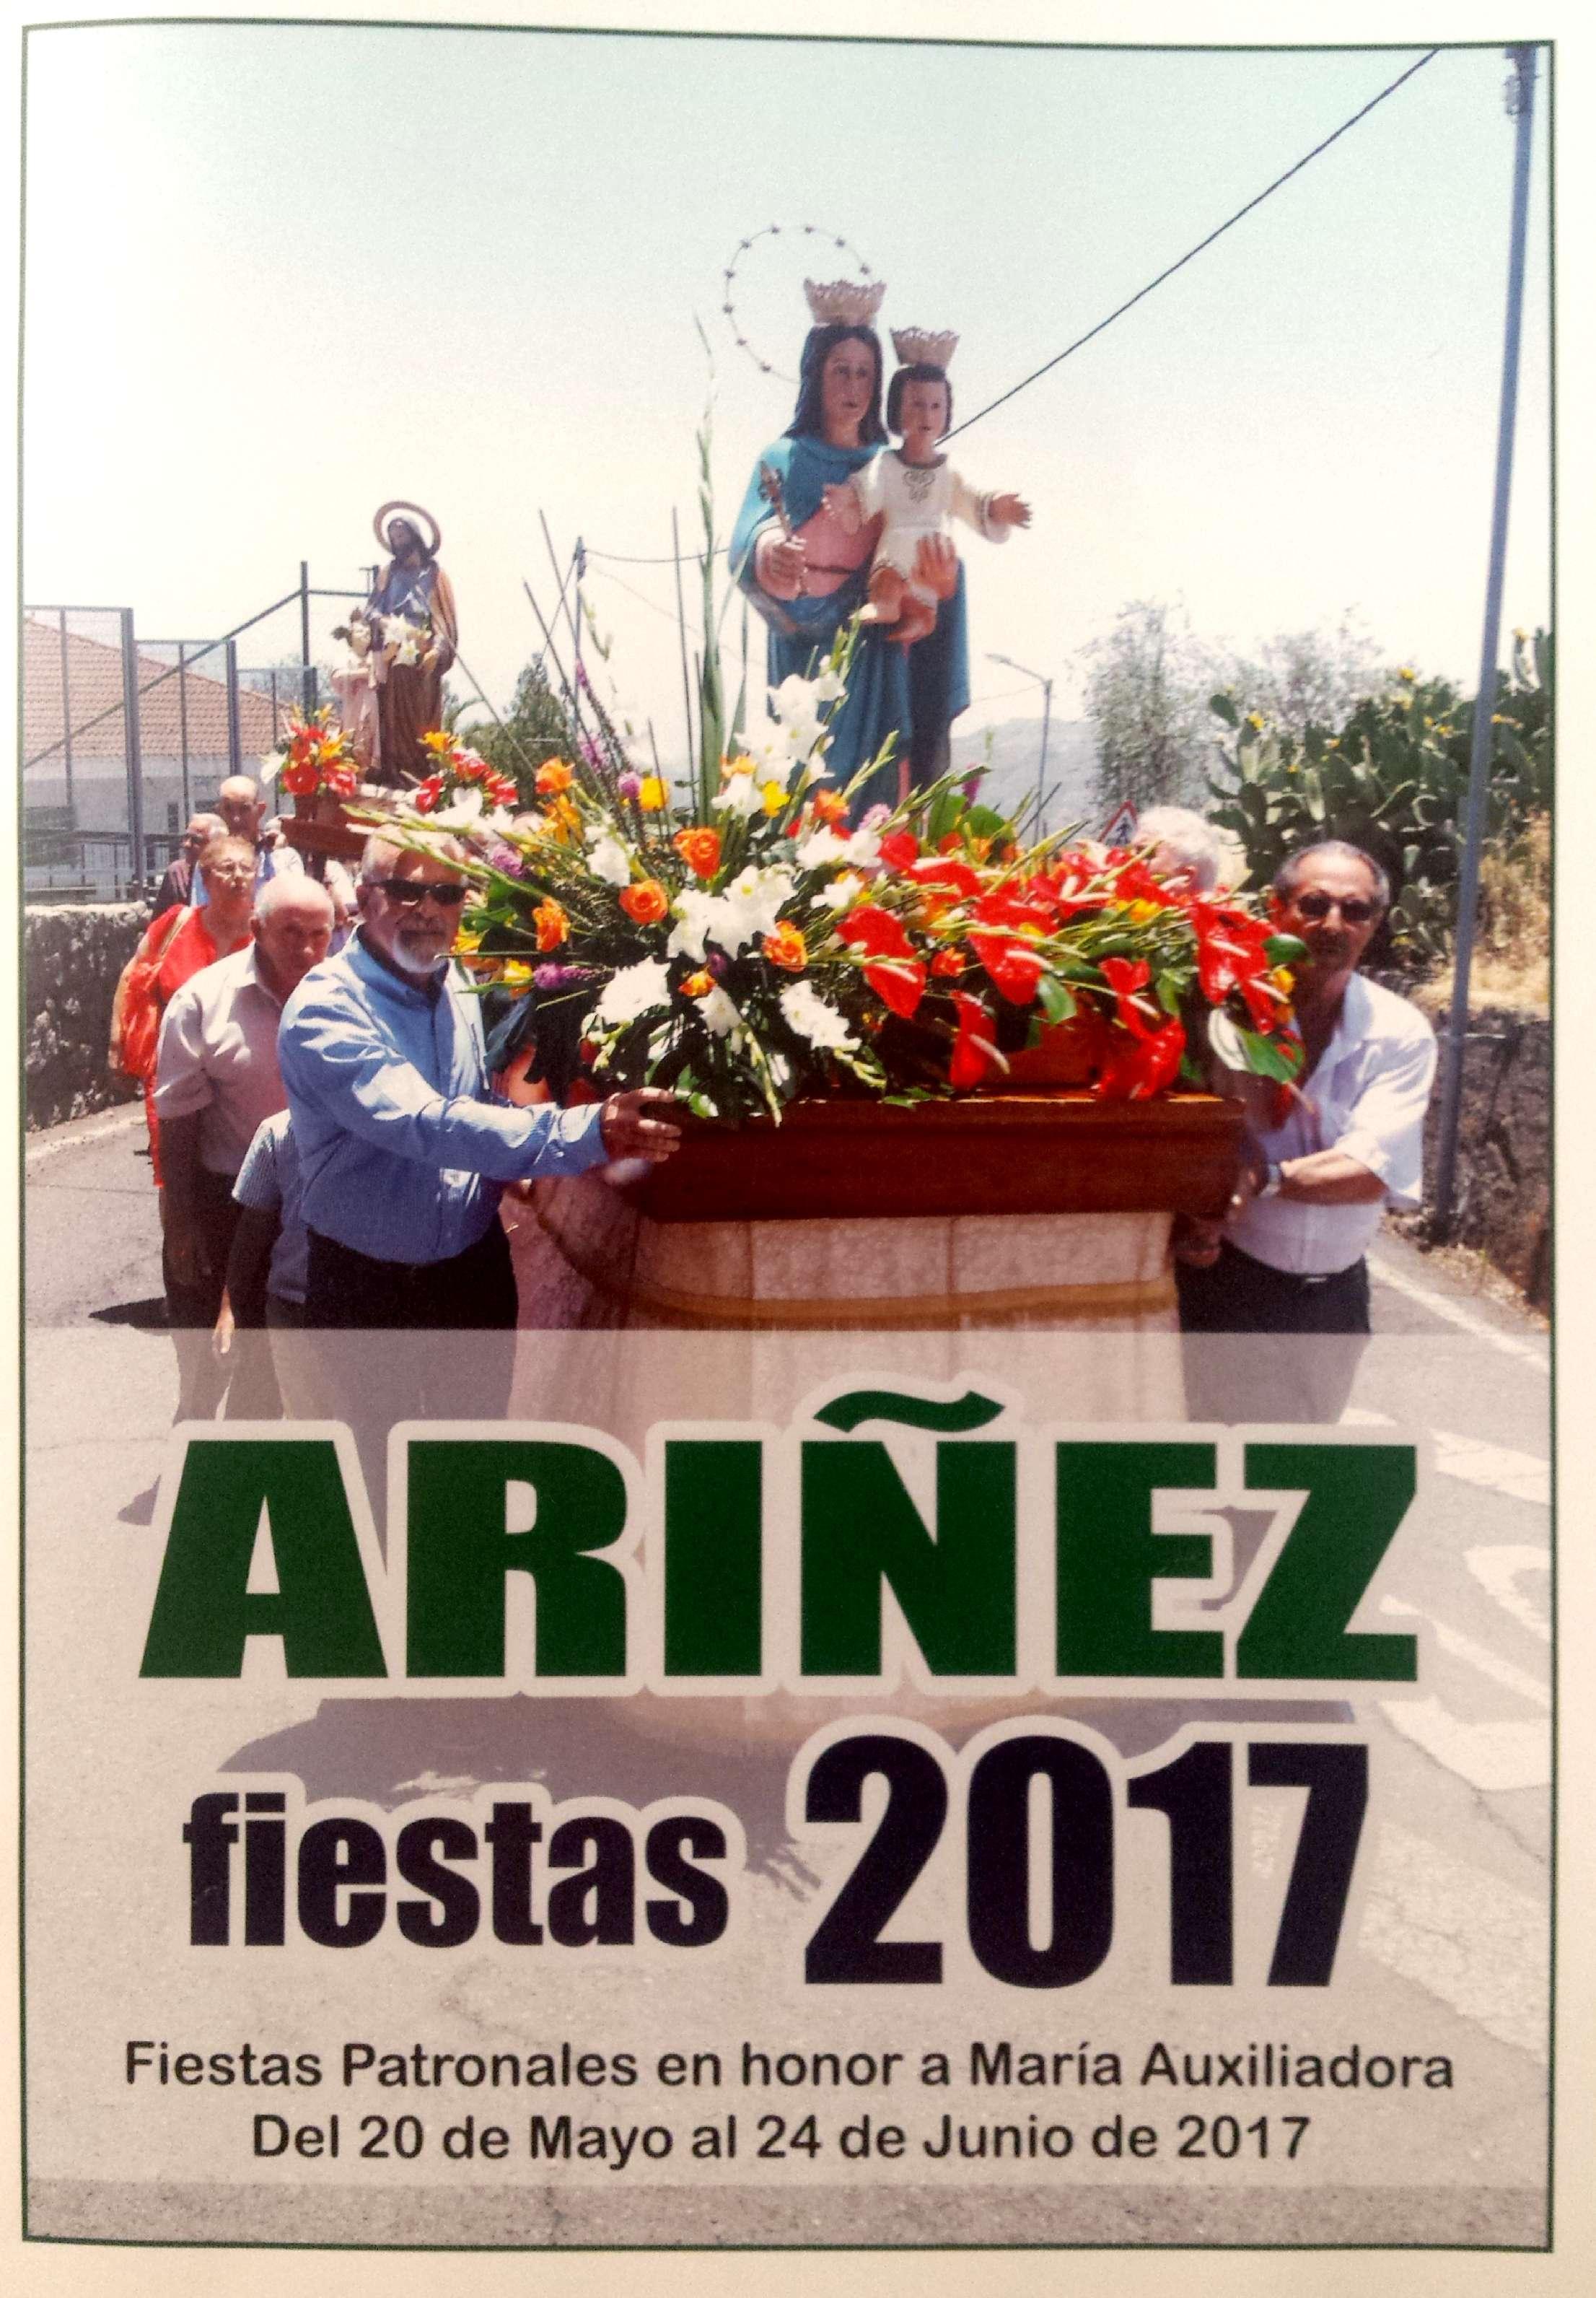 NuevoDocumento 2017 05 12 1